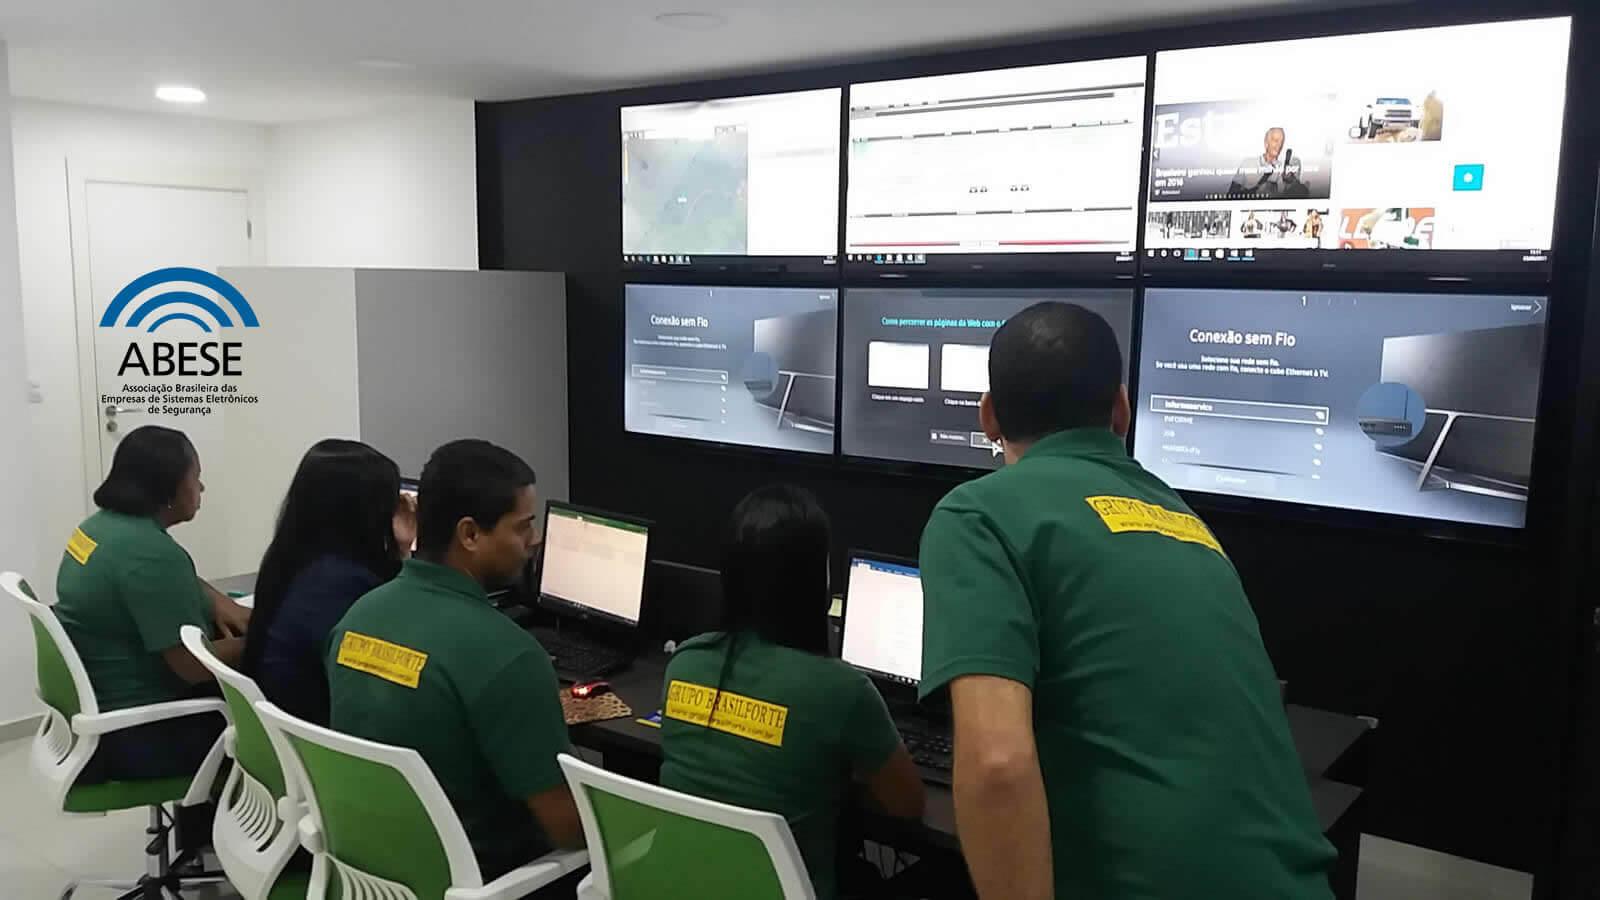 Fundo 1 - Informeservice - Segurança Eletronica RJ